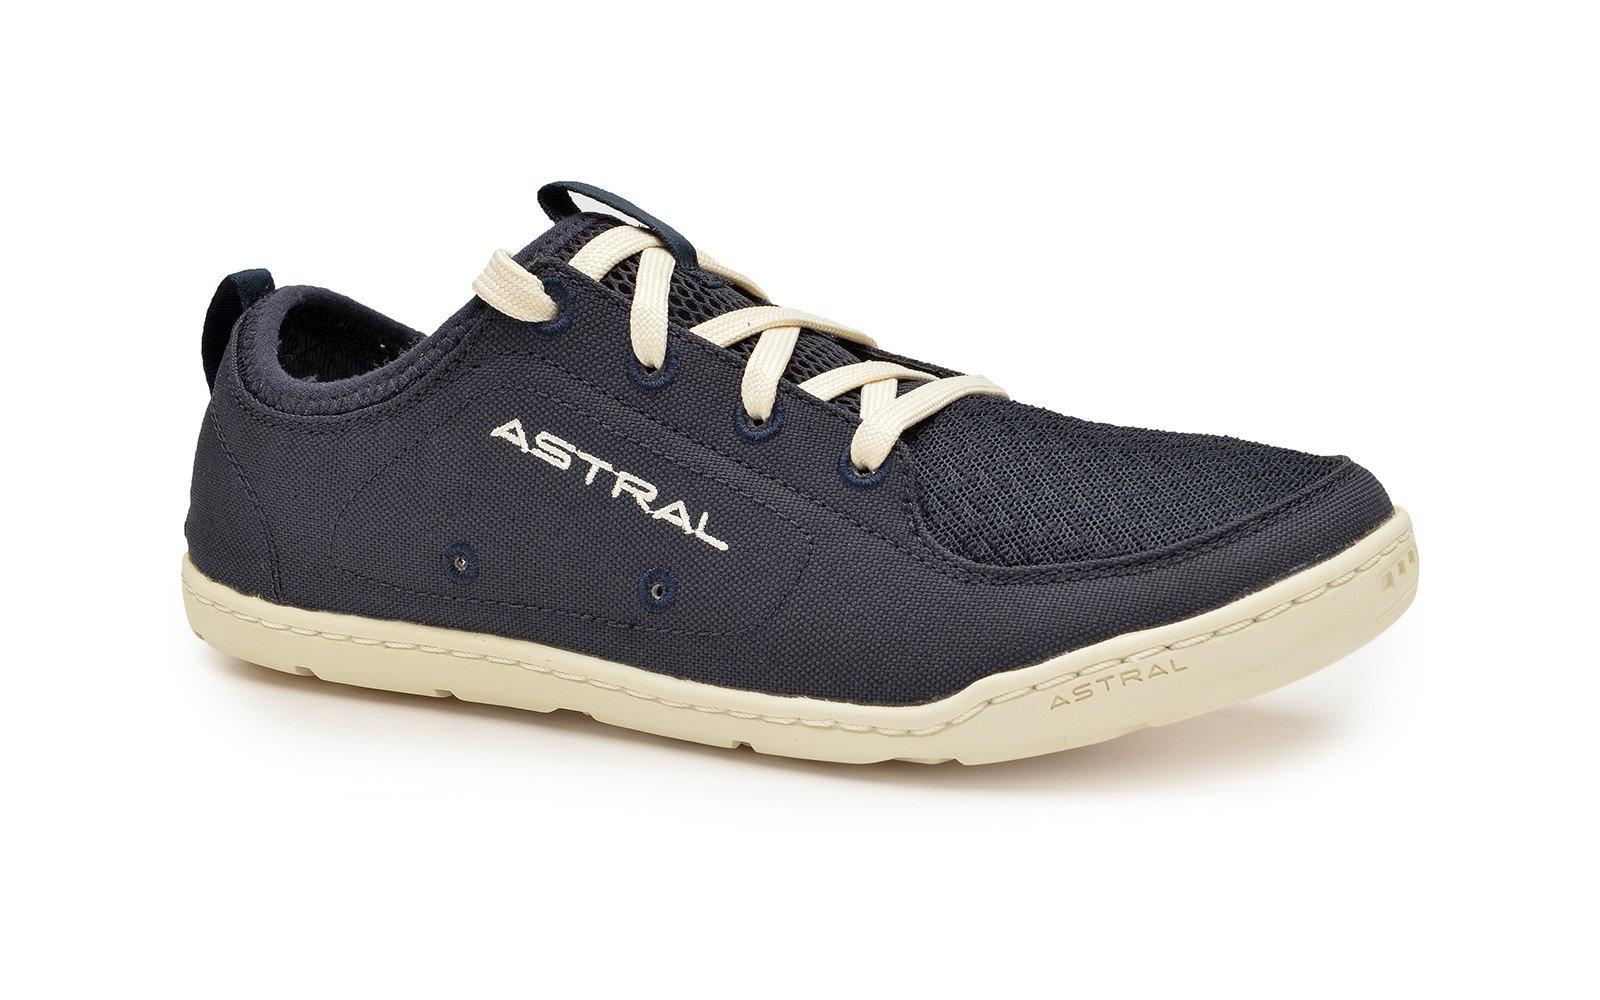 Dámské boty ASTRAL_Loyak_Ws_Navy_White_34_web.jpg